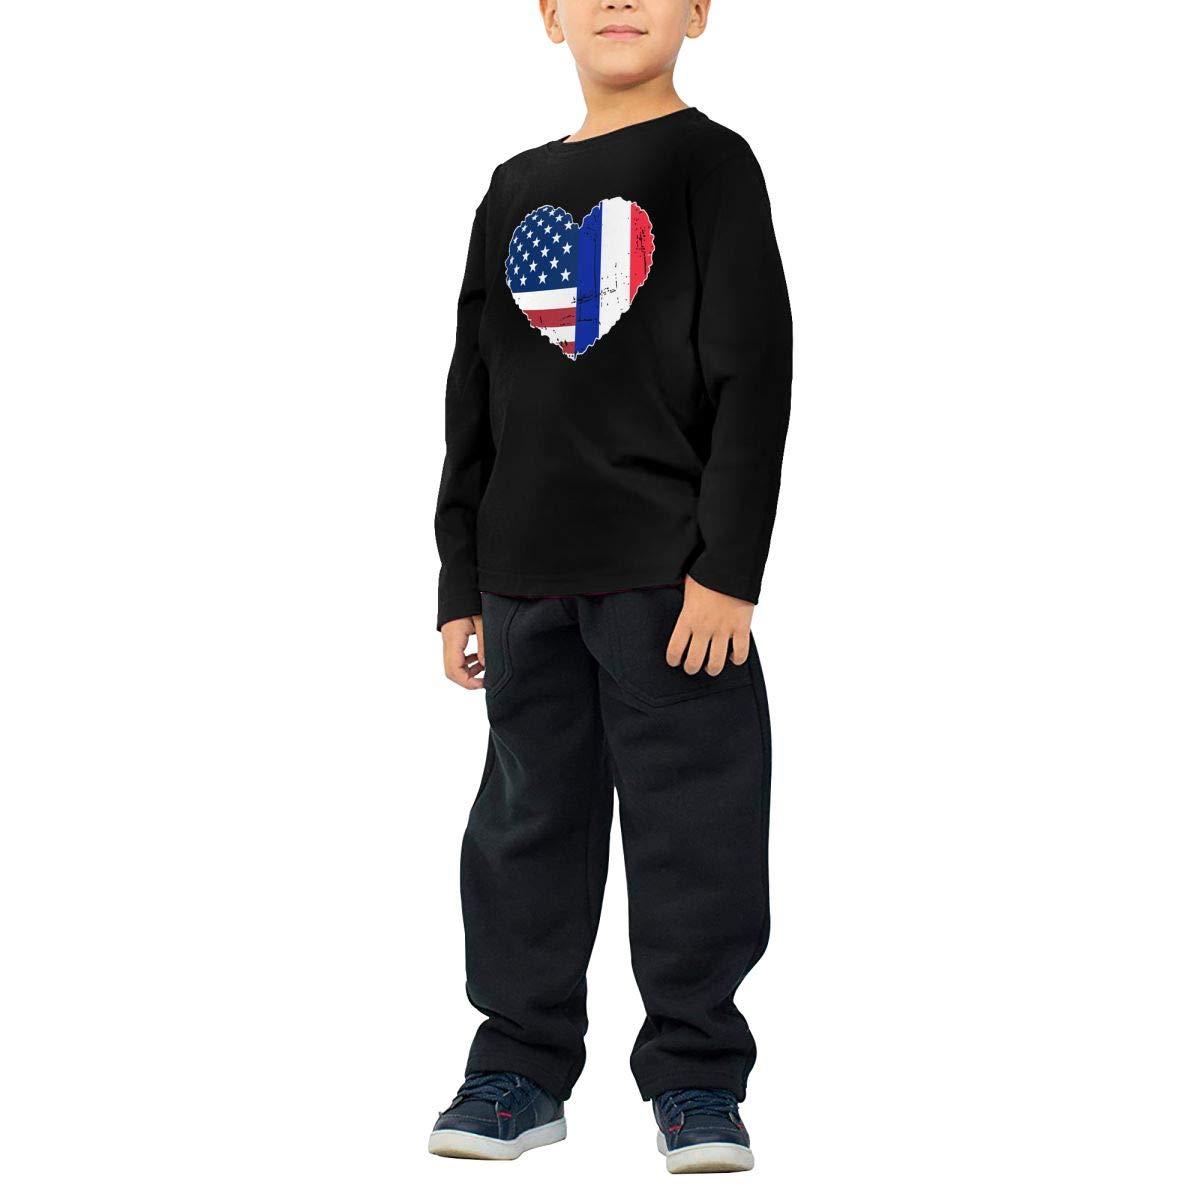 CERTONGCXTS Baby Boys Kids France USA Flag Heart ComfortSoft Long Sleeve Shirt